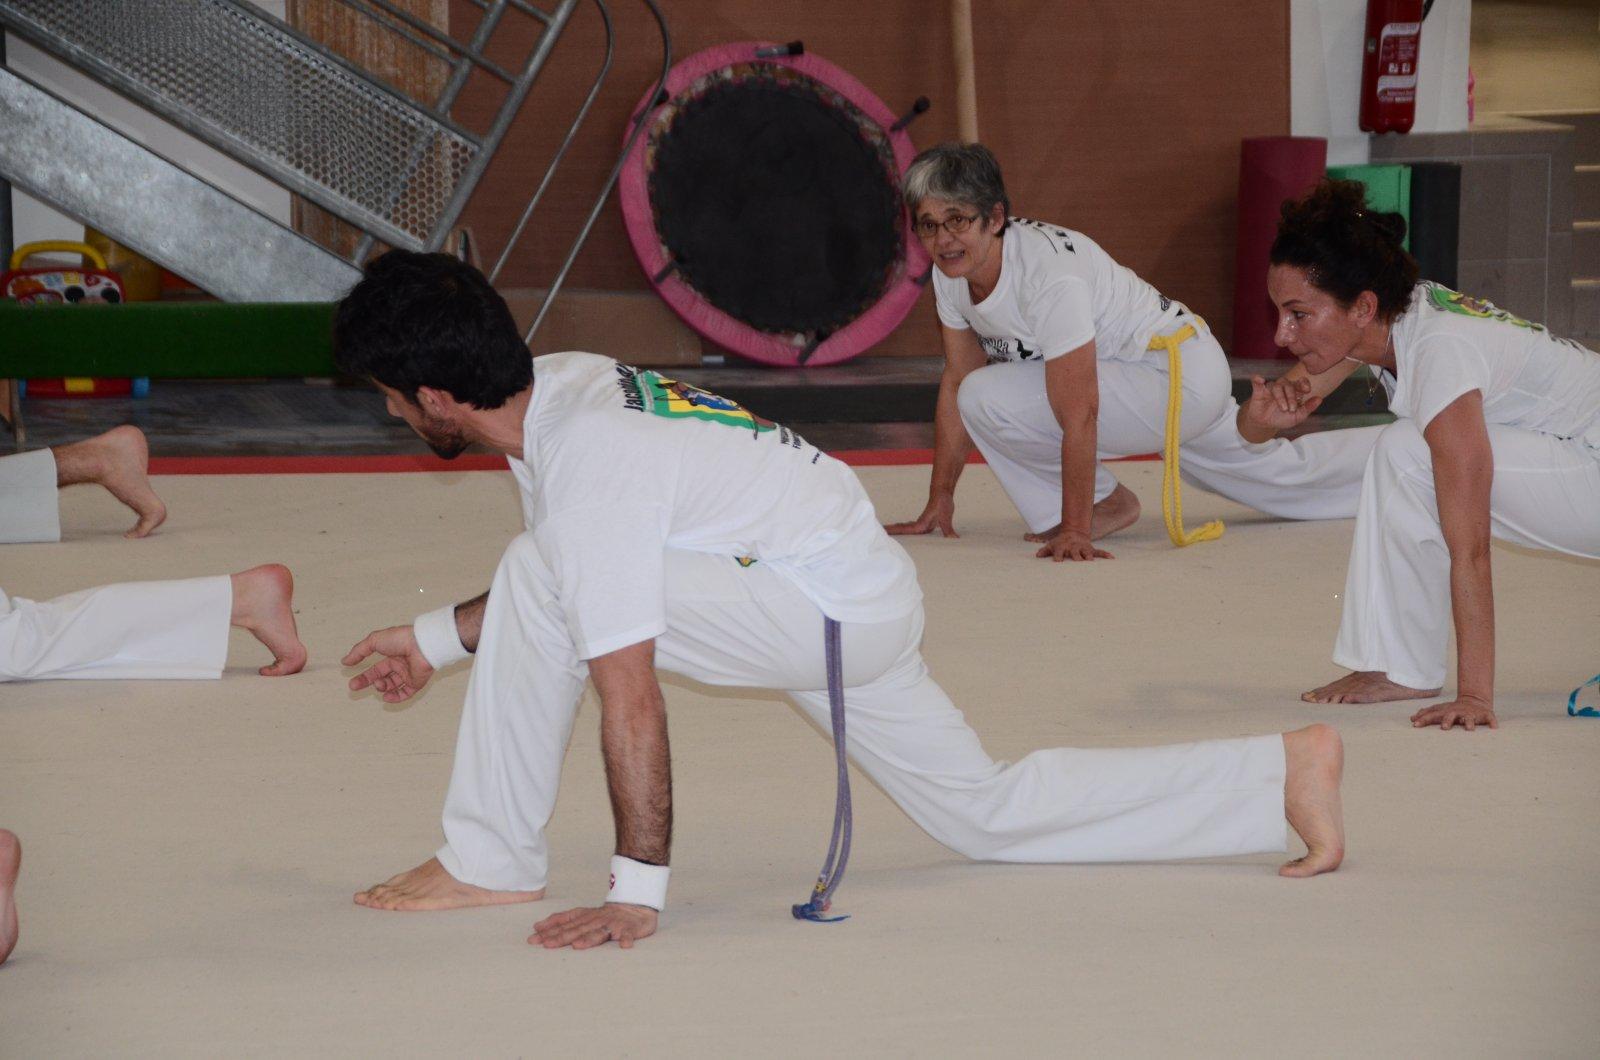 Roda E Galette 2018 Capoeira Nantes (21)